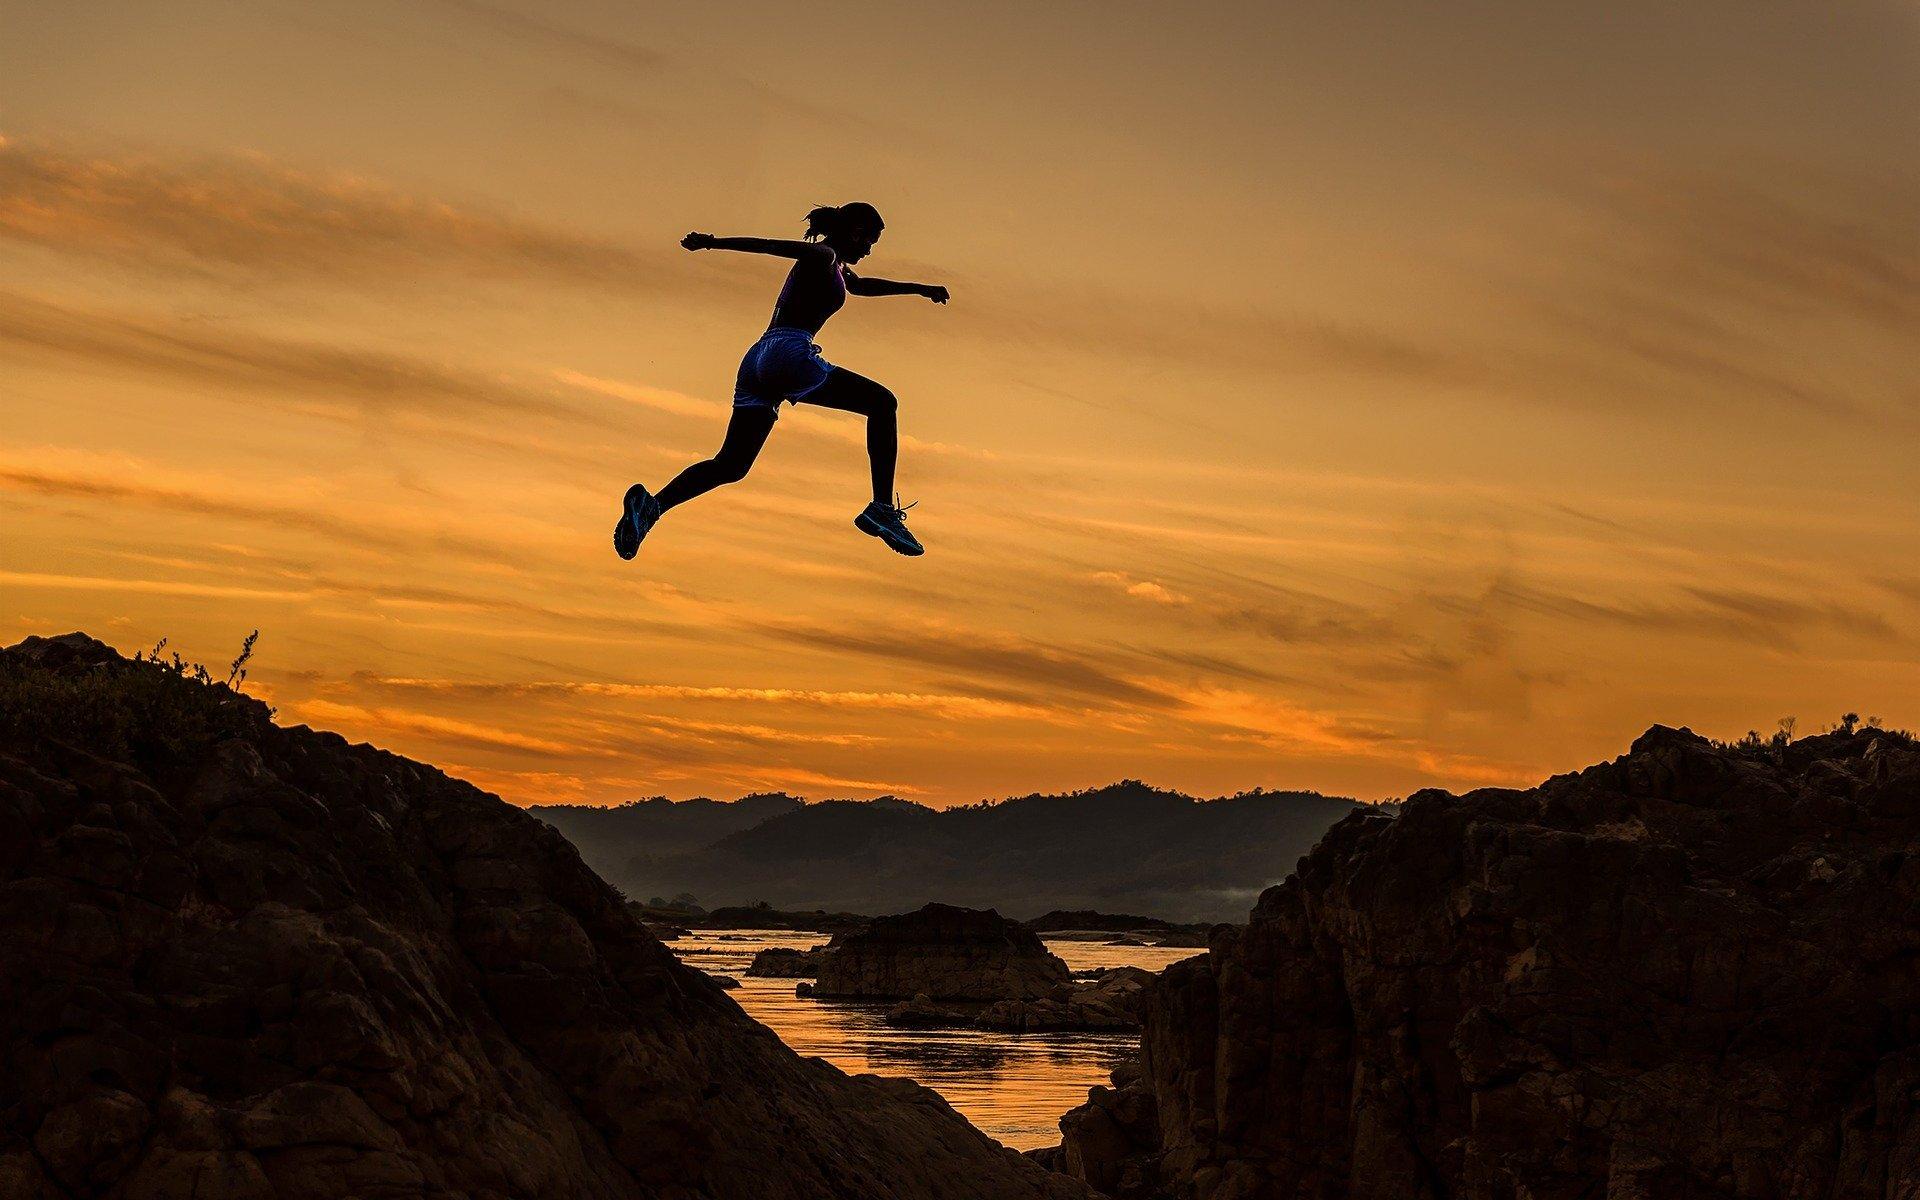 Female athlete jumping above ground near sunlit sky